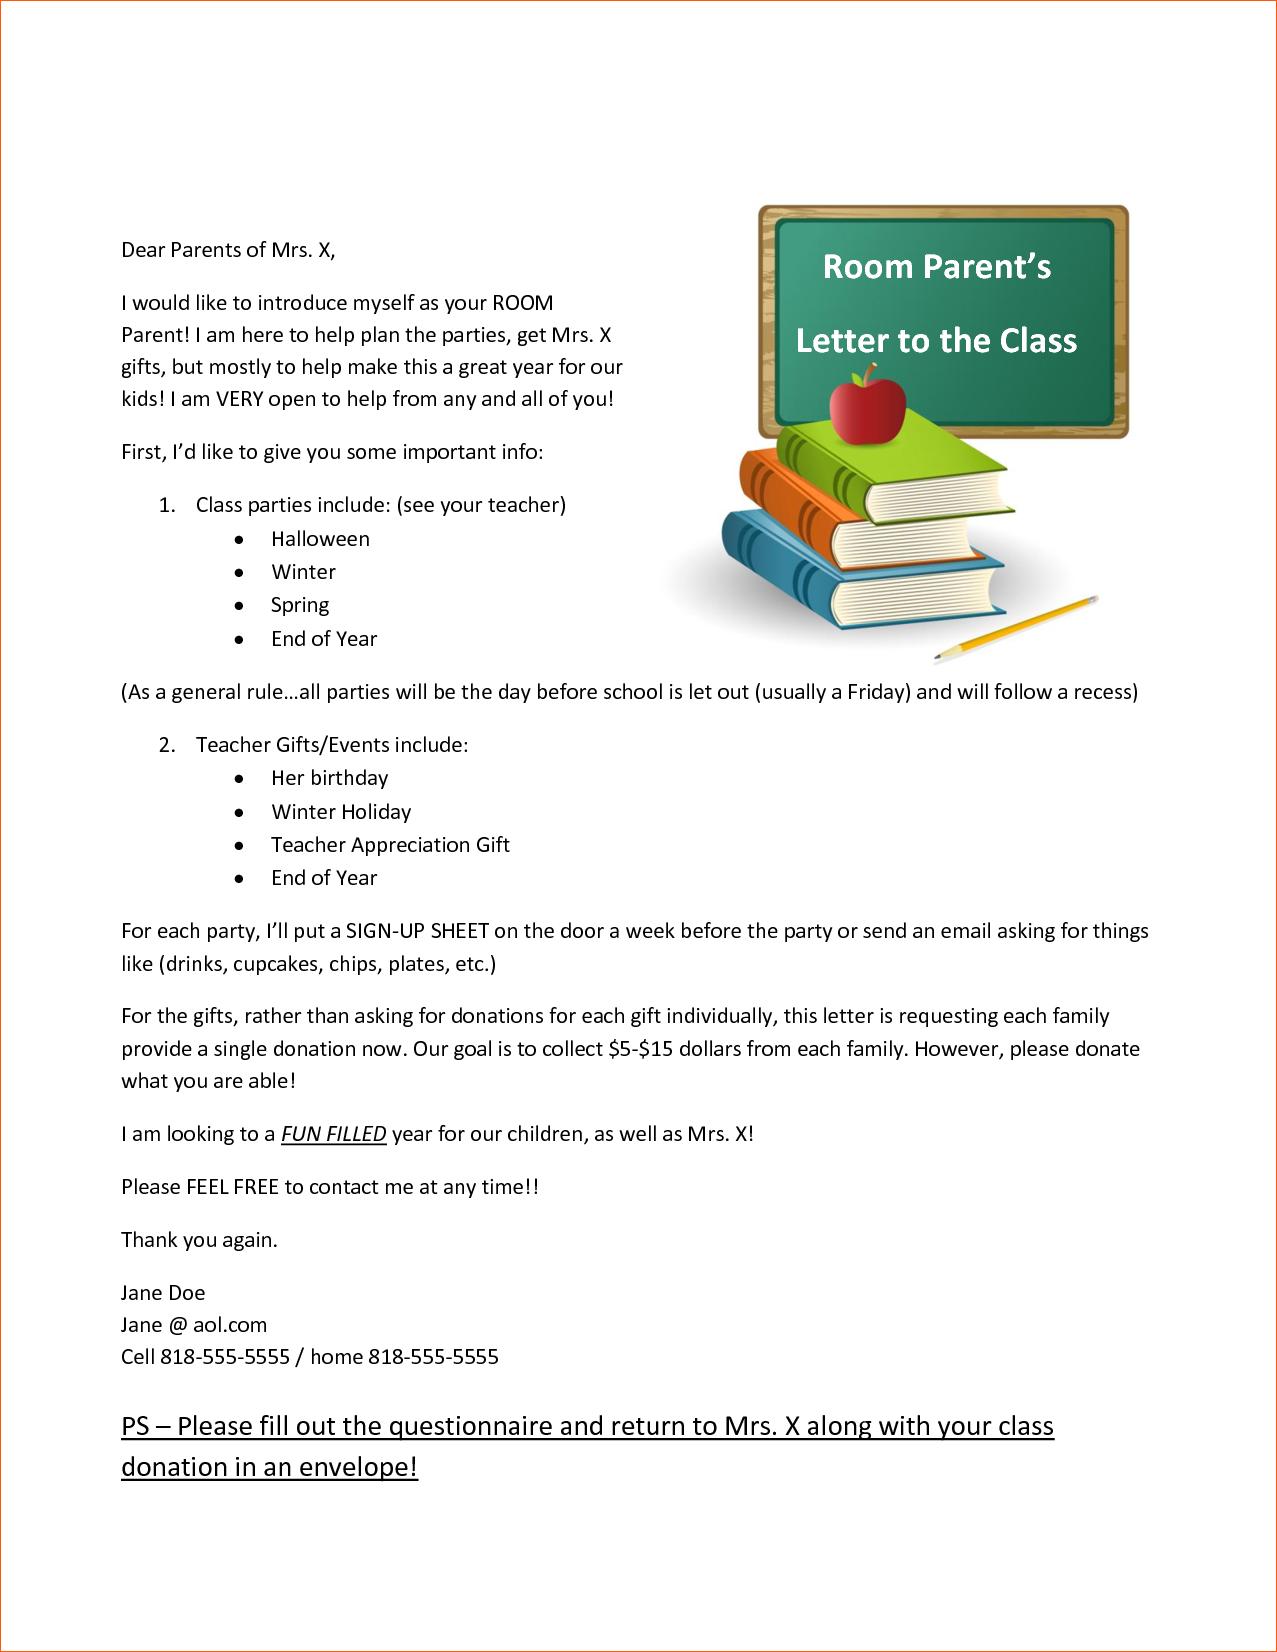 Room Parent Letter - Westlake Elementary School by